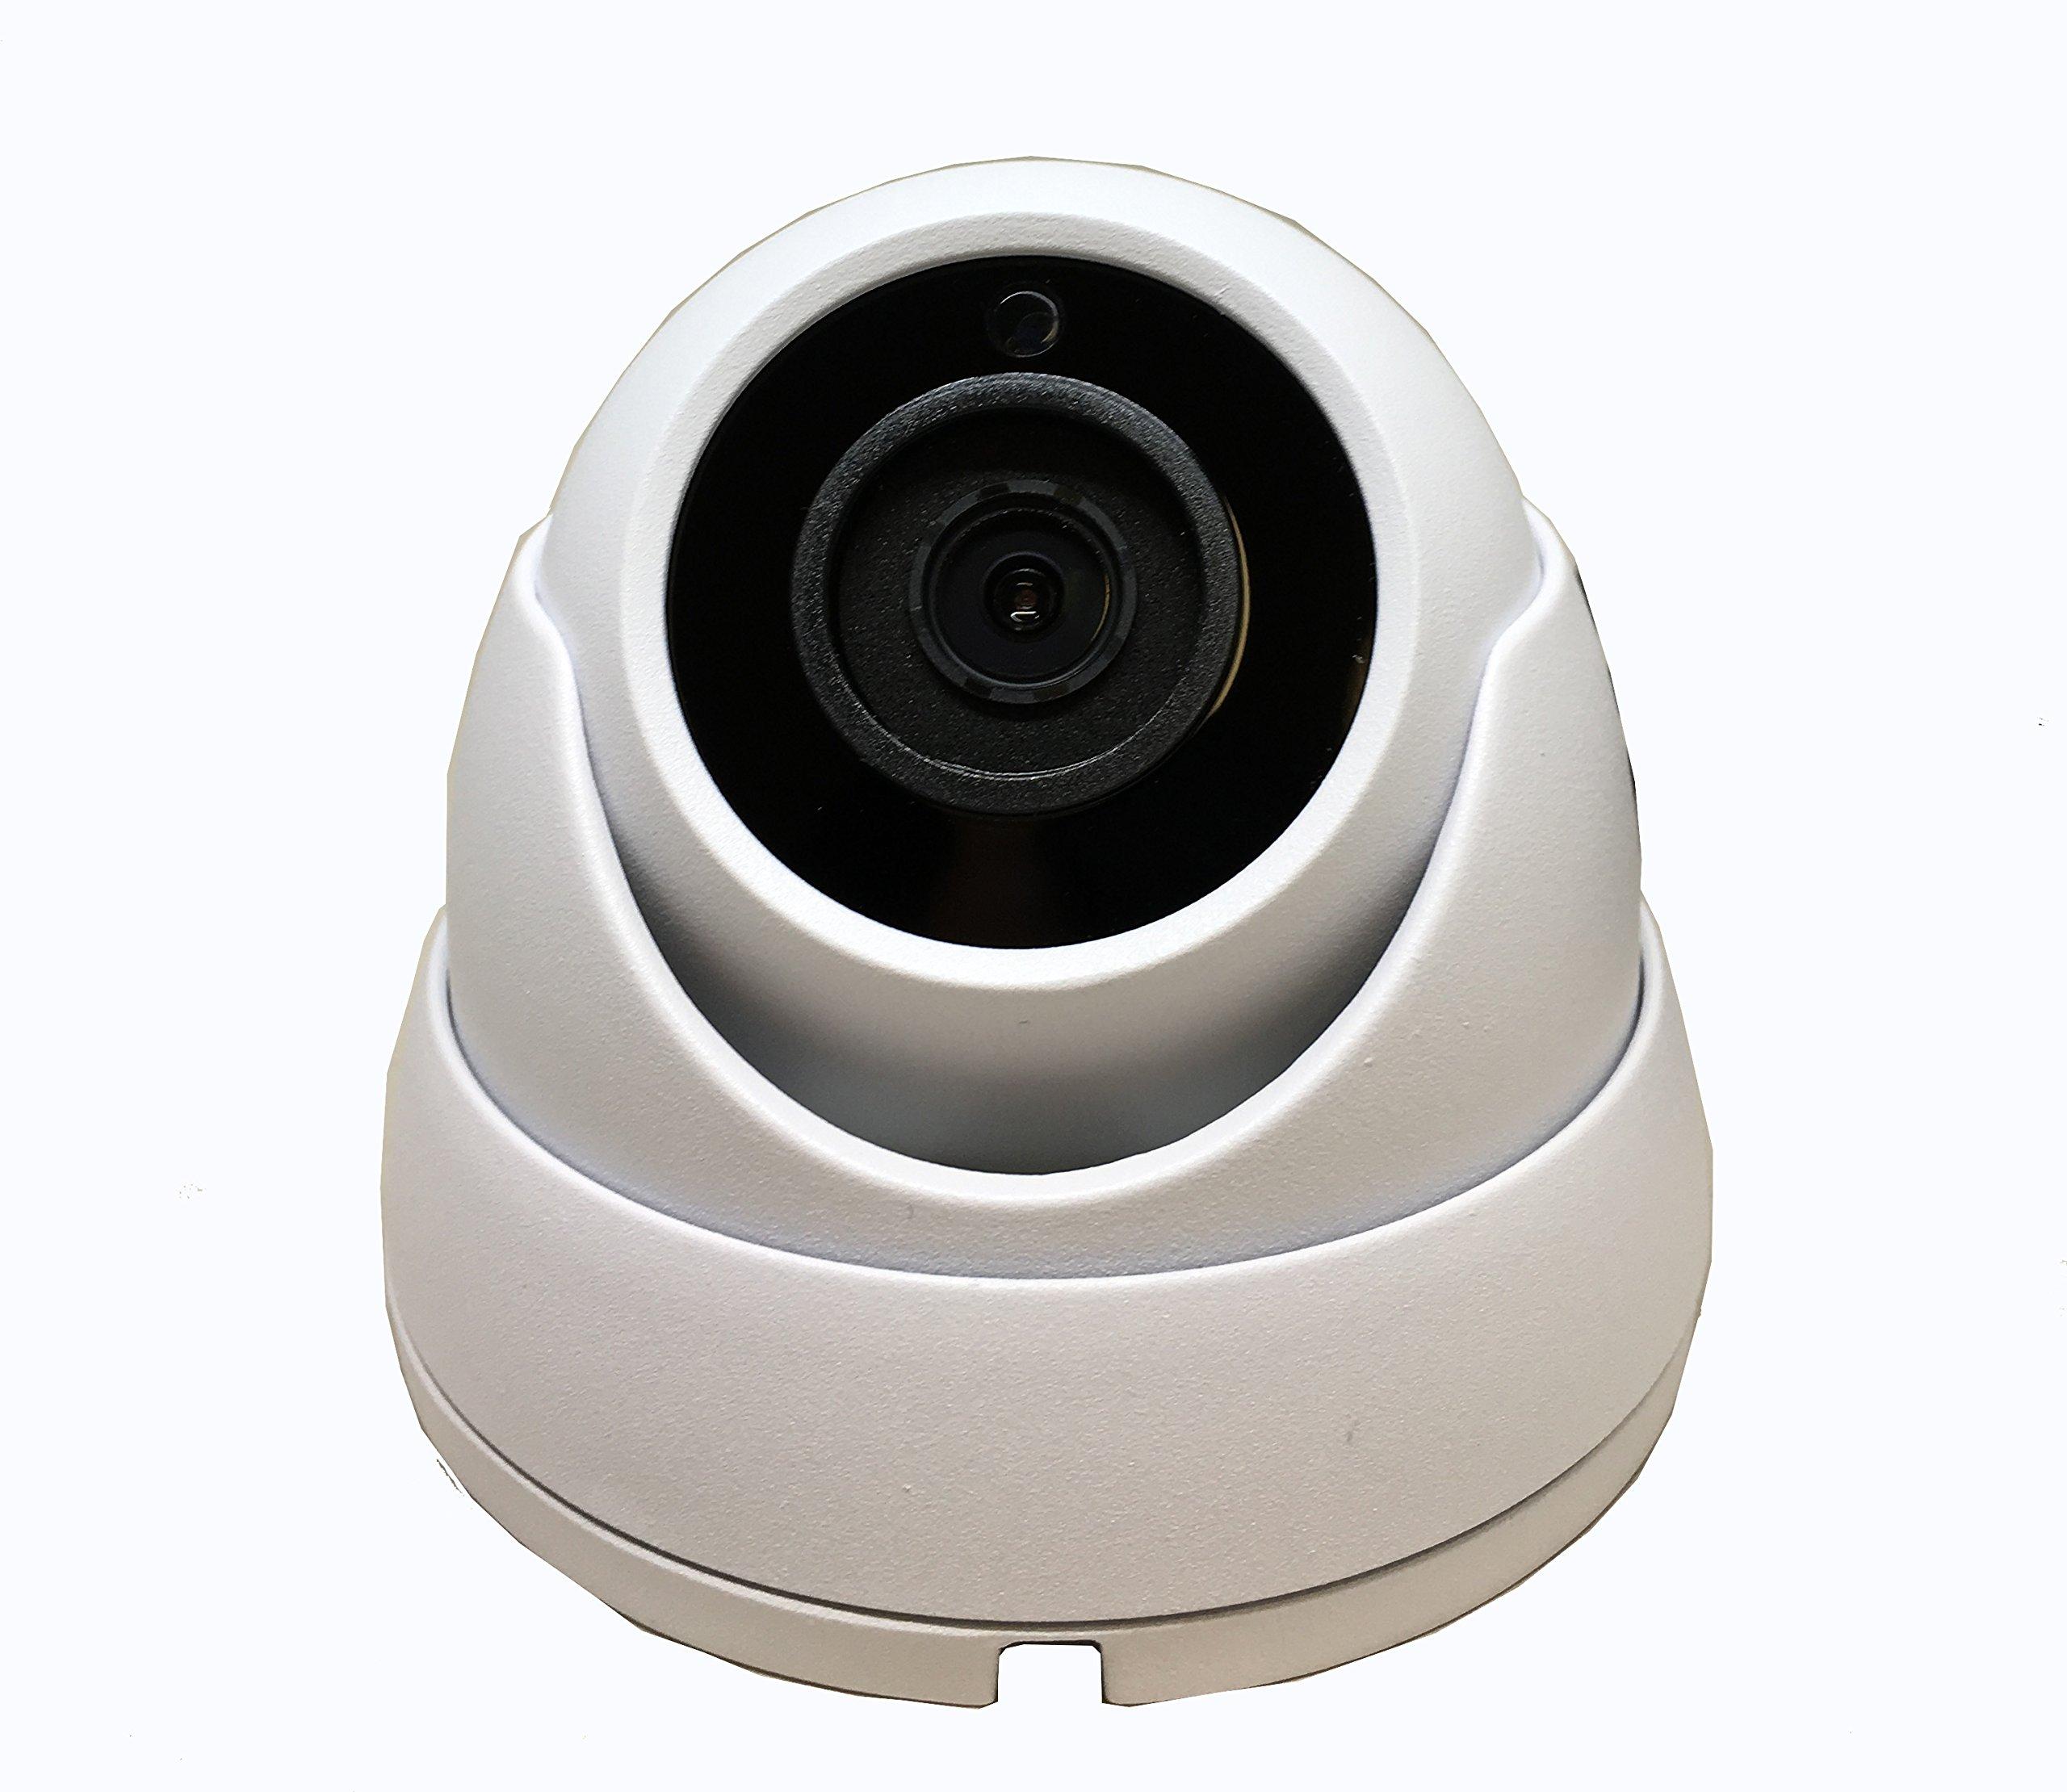 101AV Security Dome Camera 1080P 1920x1080 True Full-HD 4in1(TVI, AHD, CVI, CVBS) 3.6mm Fixed Lens 2.4 Megapixel STARVIS Image Sensor In/Outdoor Smart IR DWDR Surveillance Home Office (White) by 101 AV Inc